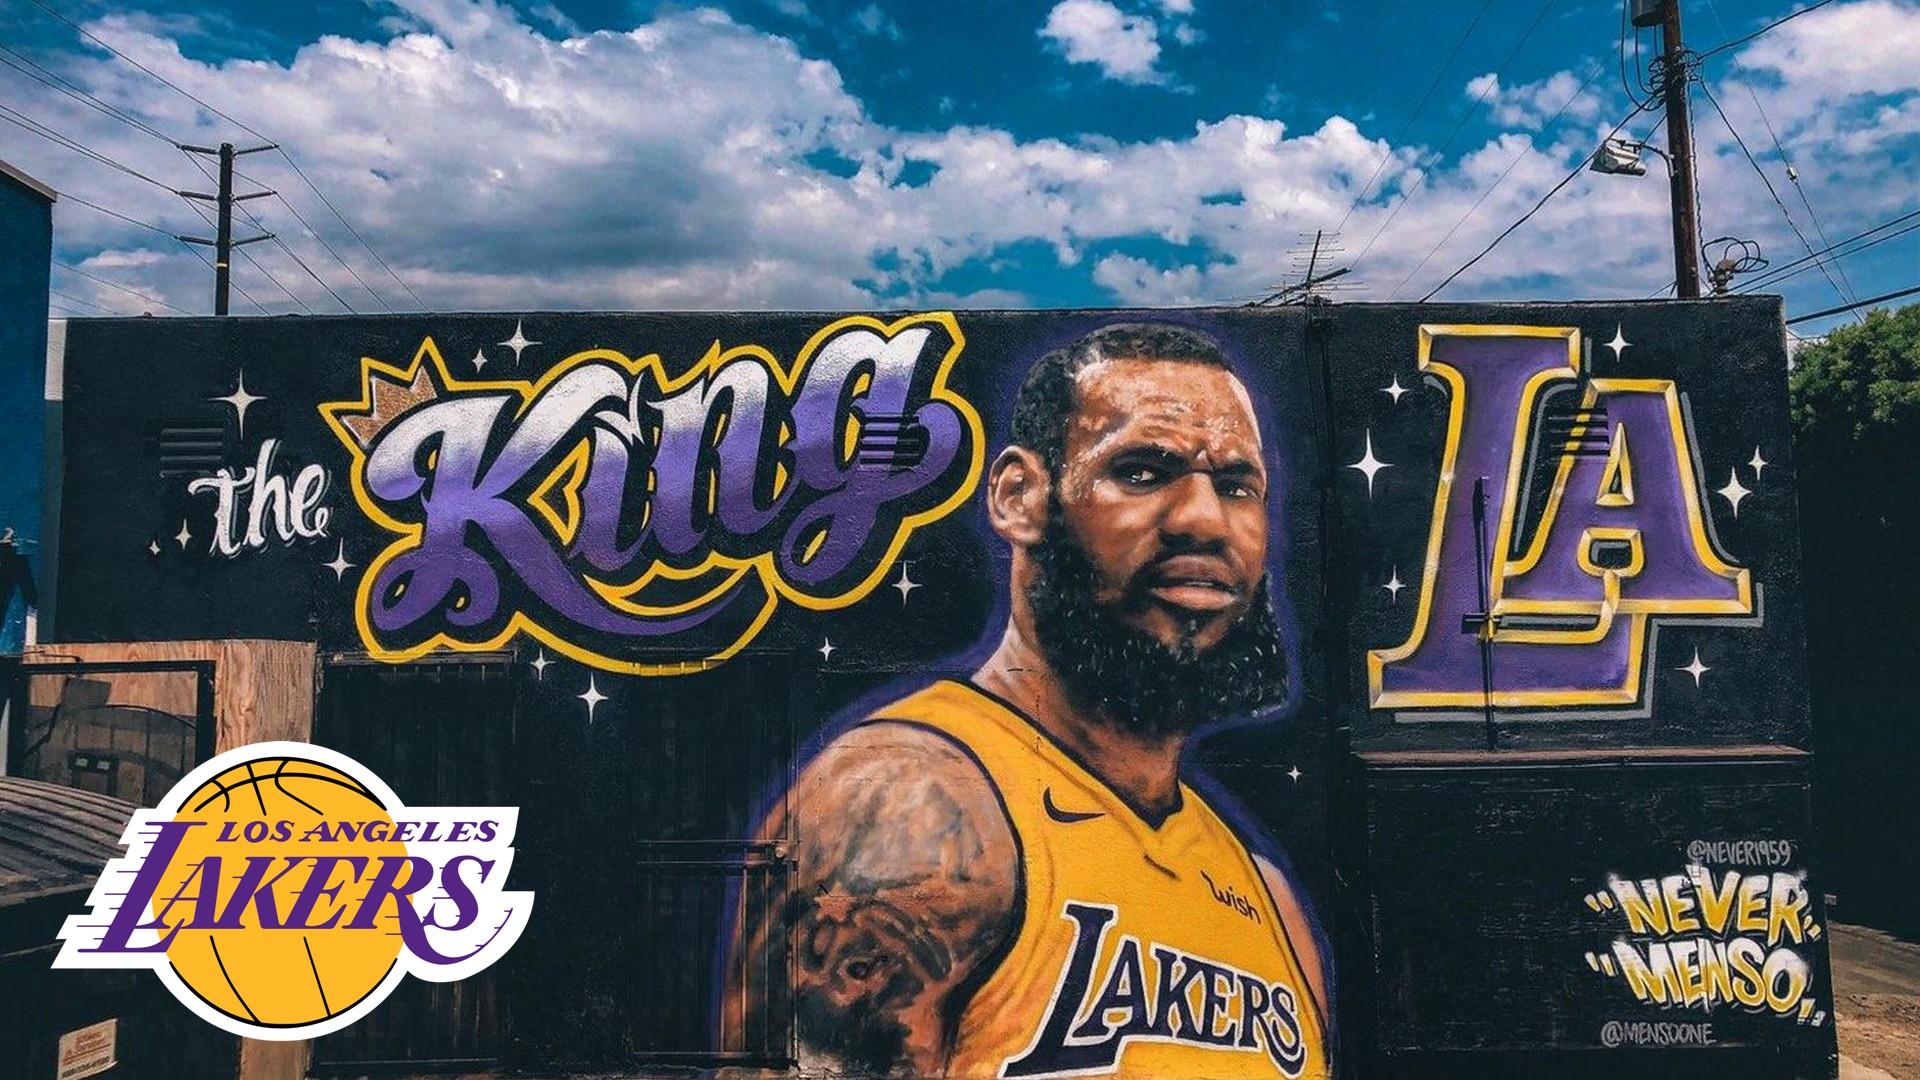 Animated Nba Wallpapers Lebron James La Lakers Wallpaper 2019 Basketball Wallpaper